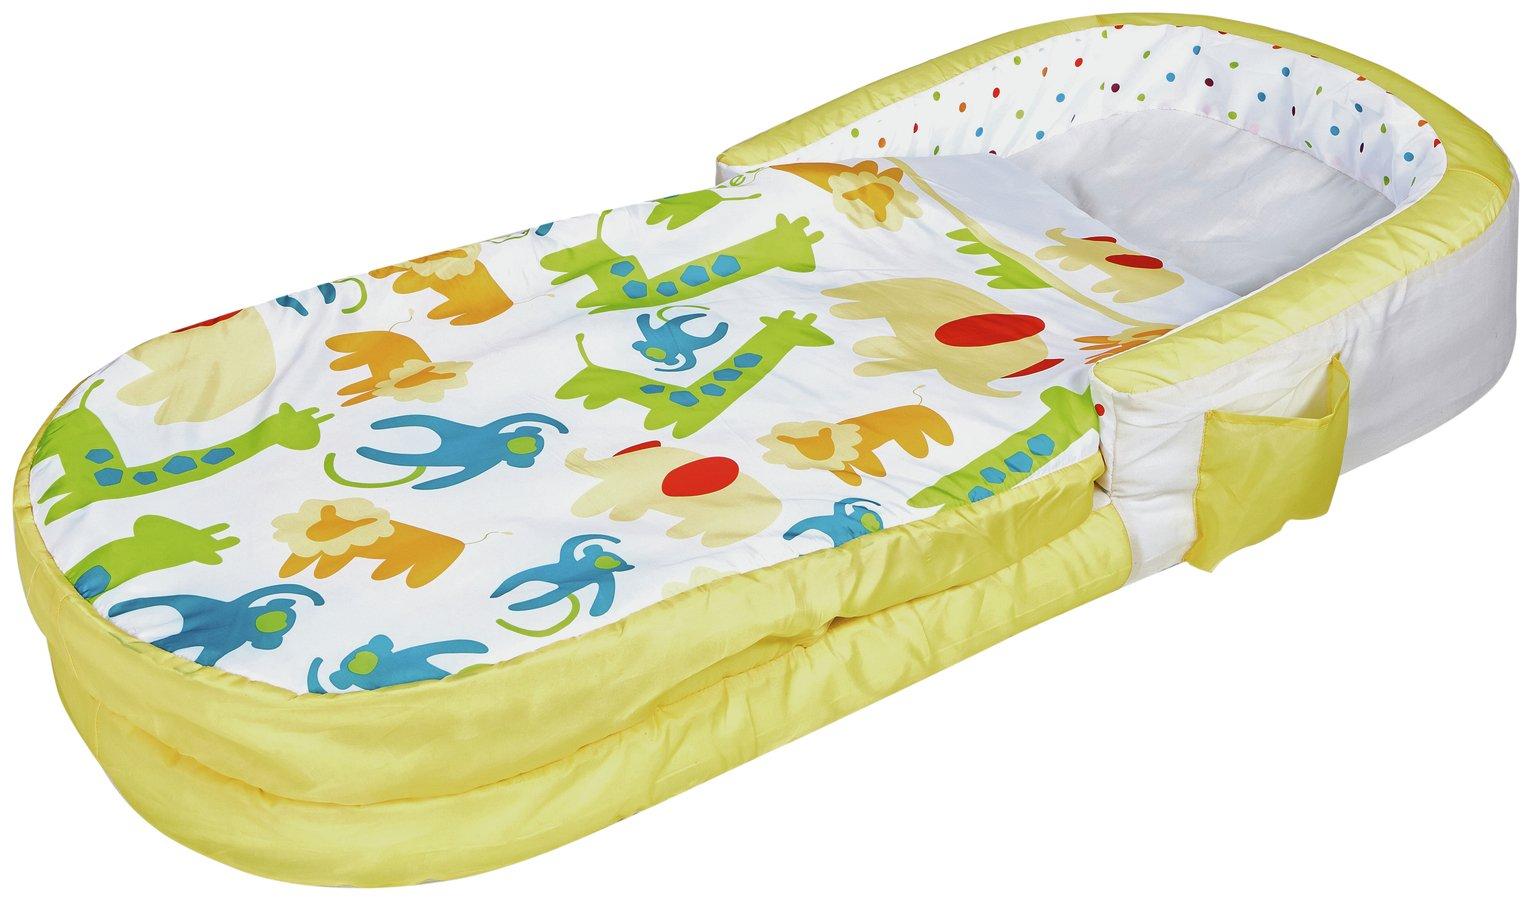 My First Ready Bed In The Night Garden Argos